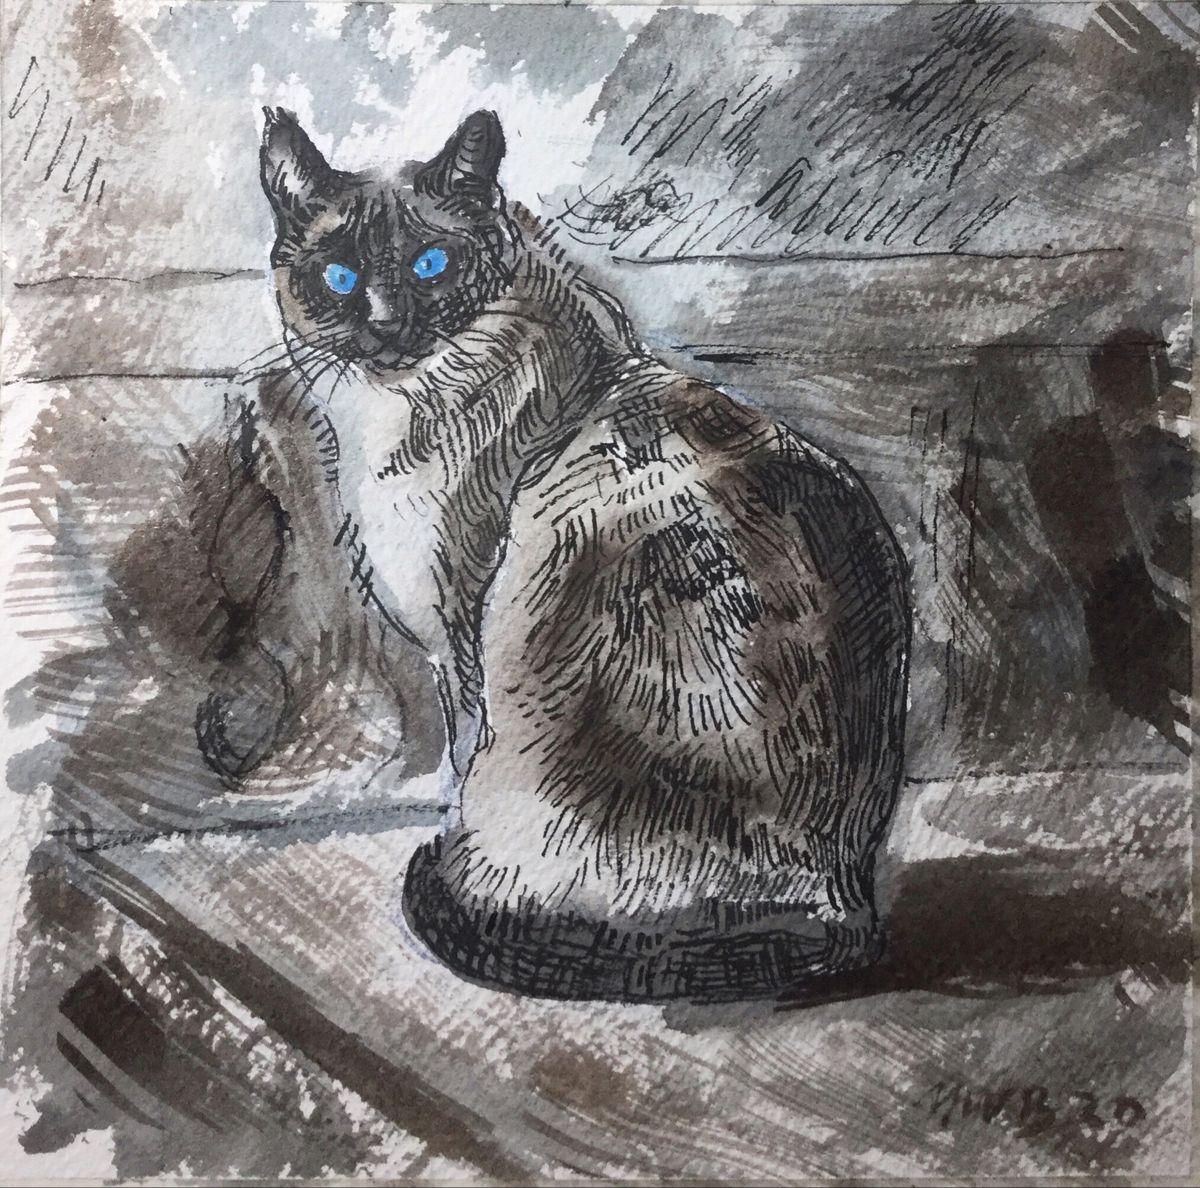 Decided to do an inktober of cats. Day 3 #inktobercats #inktobercat #inktober2020 #inktober #inkdrawing #inkdrawings #inkonpaper #catsofinstagram #catdrawing #inktobercatho2019 #mycreativity #myartwork🎨 #🎨 #🎨🎨🎨 #artlovers #instadrawing #instaink #ink_art_gallery #artistsoninsta #artistsofinstagra